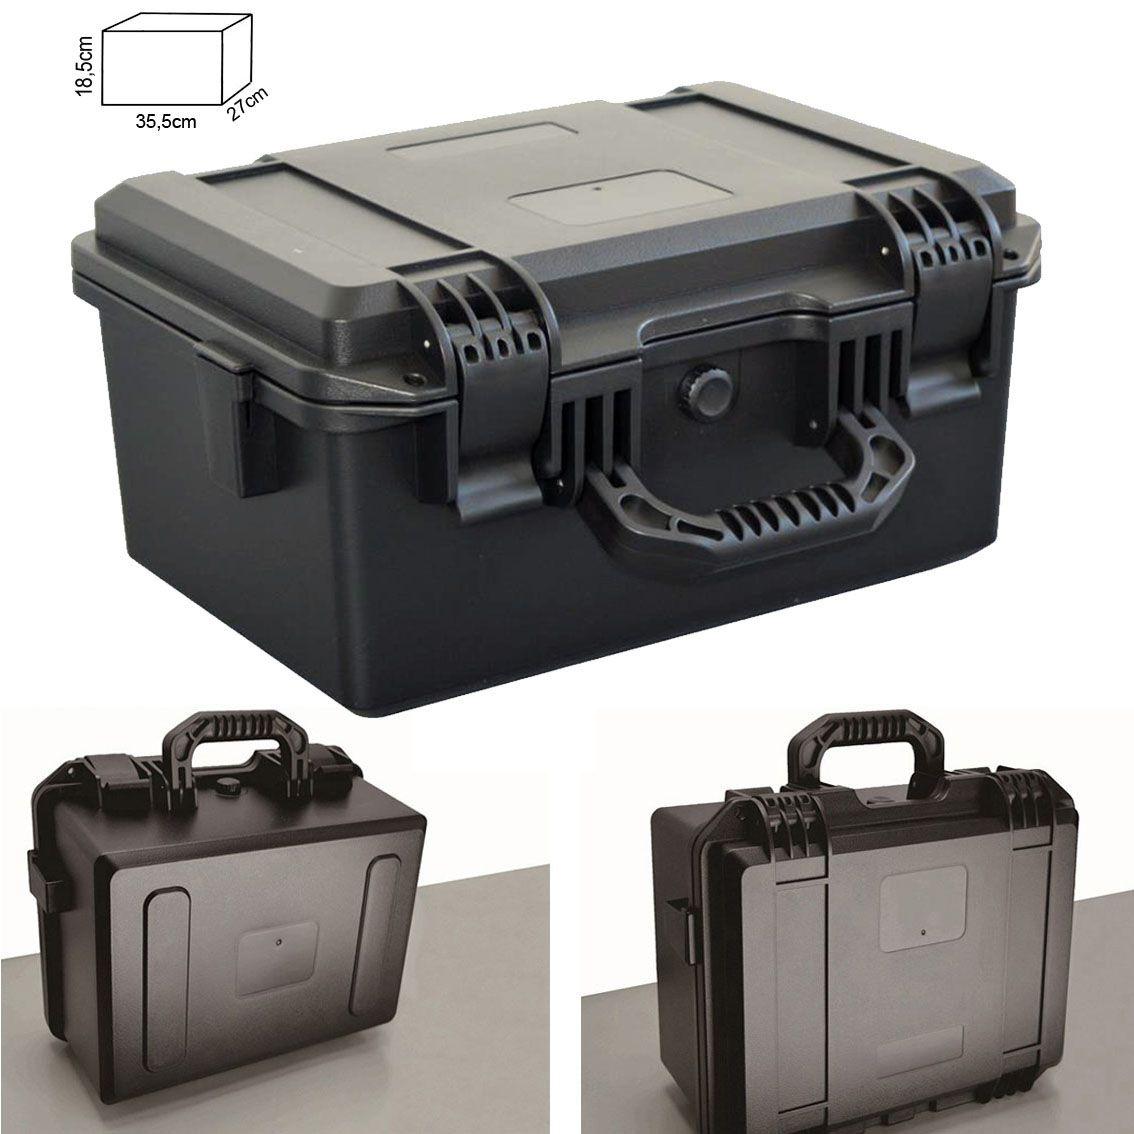 Case Mala Rigida - CaseONE YF2133 Foam C35,5xP27,0xA18,5cm  - Diafilme Materiais Fotográficos